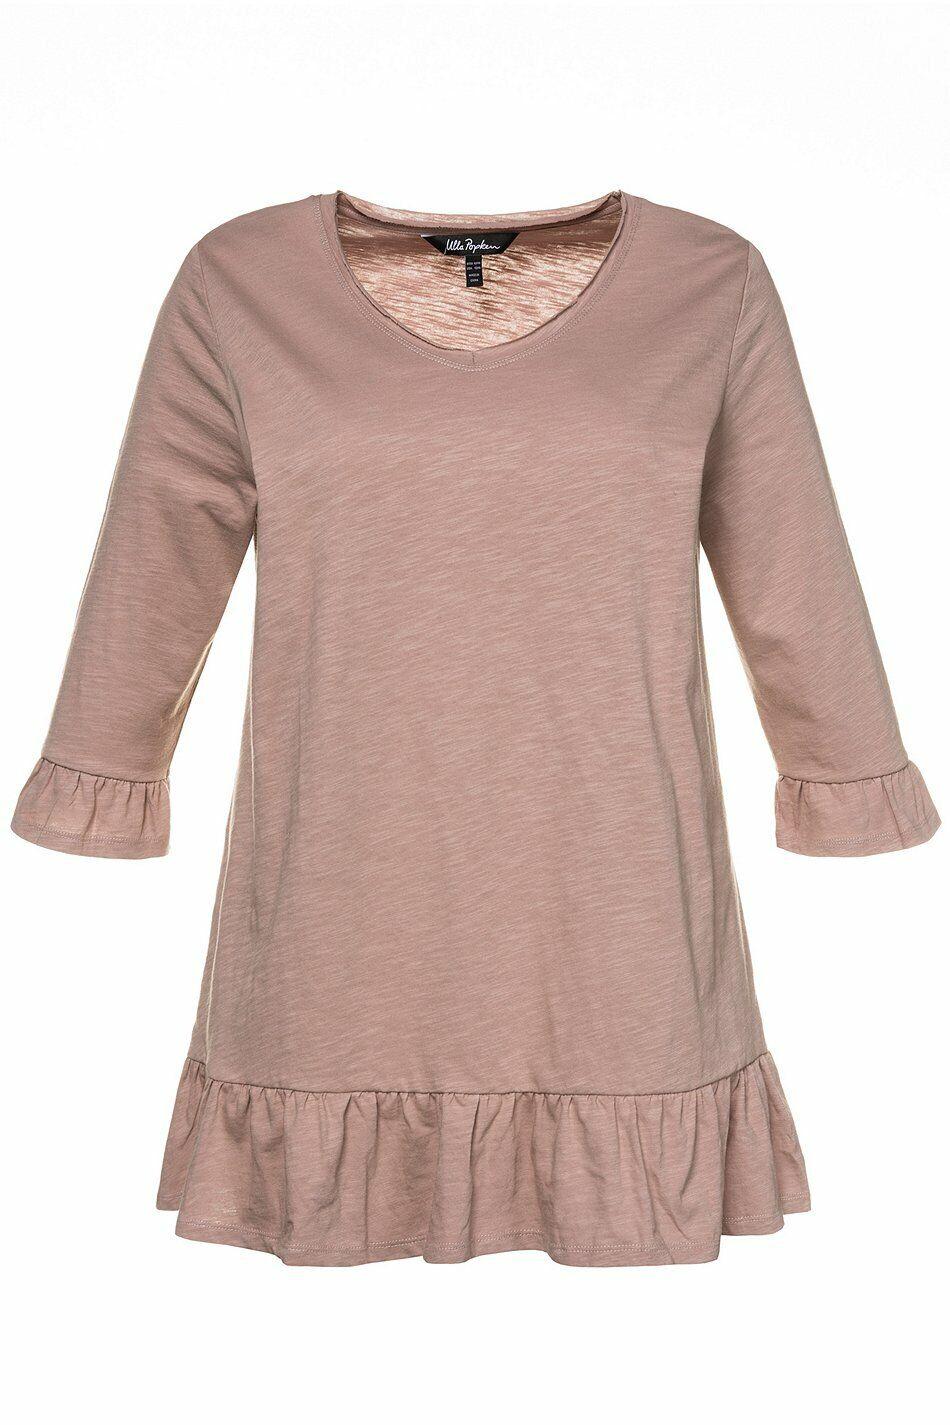 ULLA POPKEN Long- Shirt mit Volants rose NEU